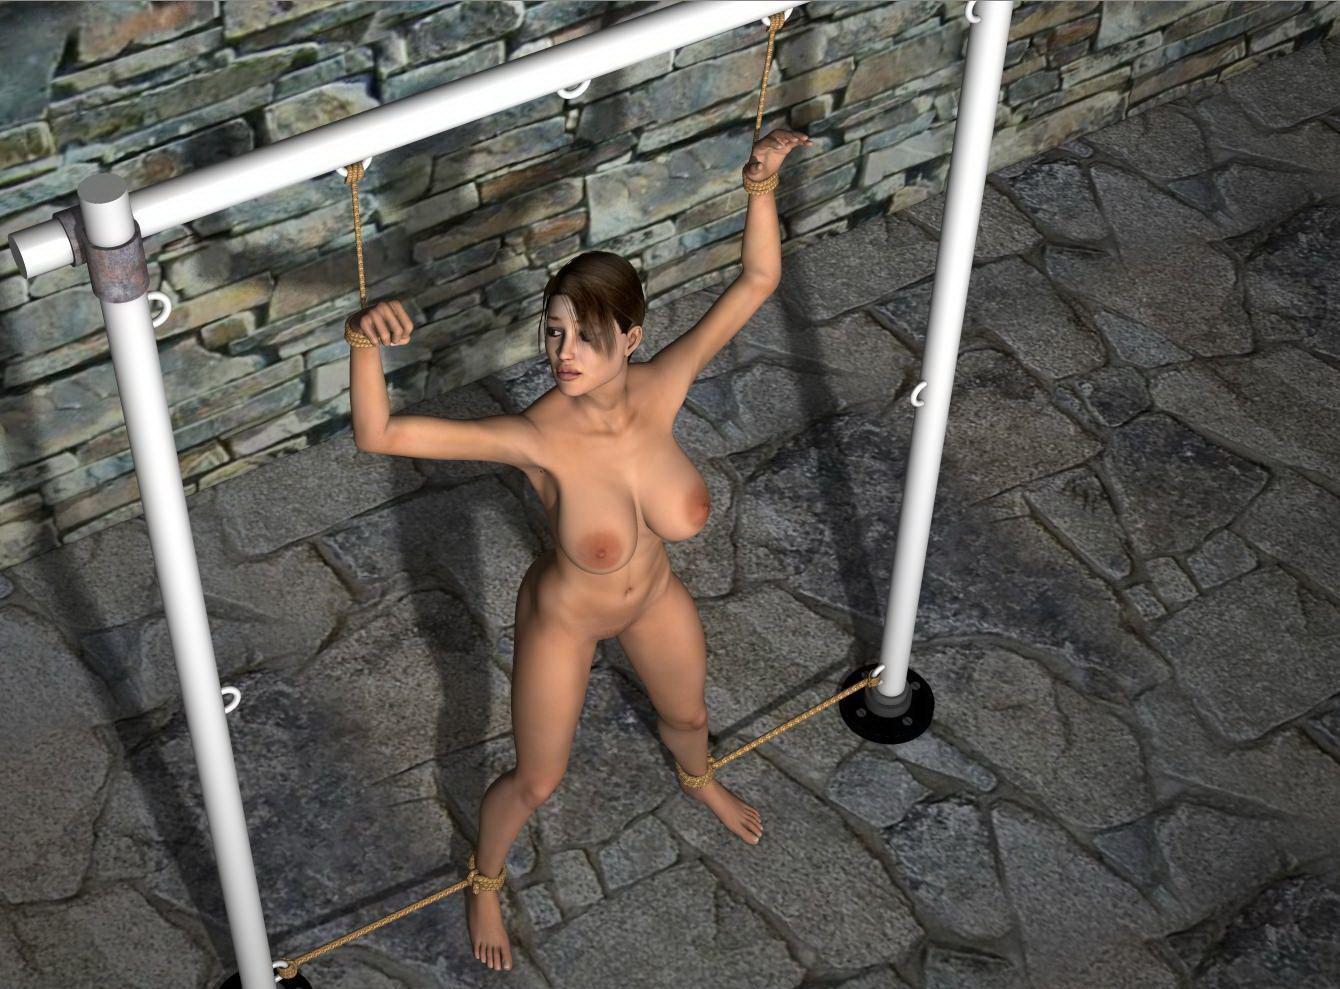 Lara croft tied tube sexual image